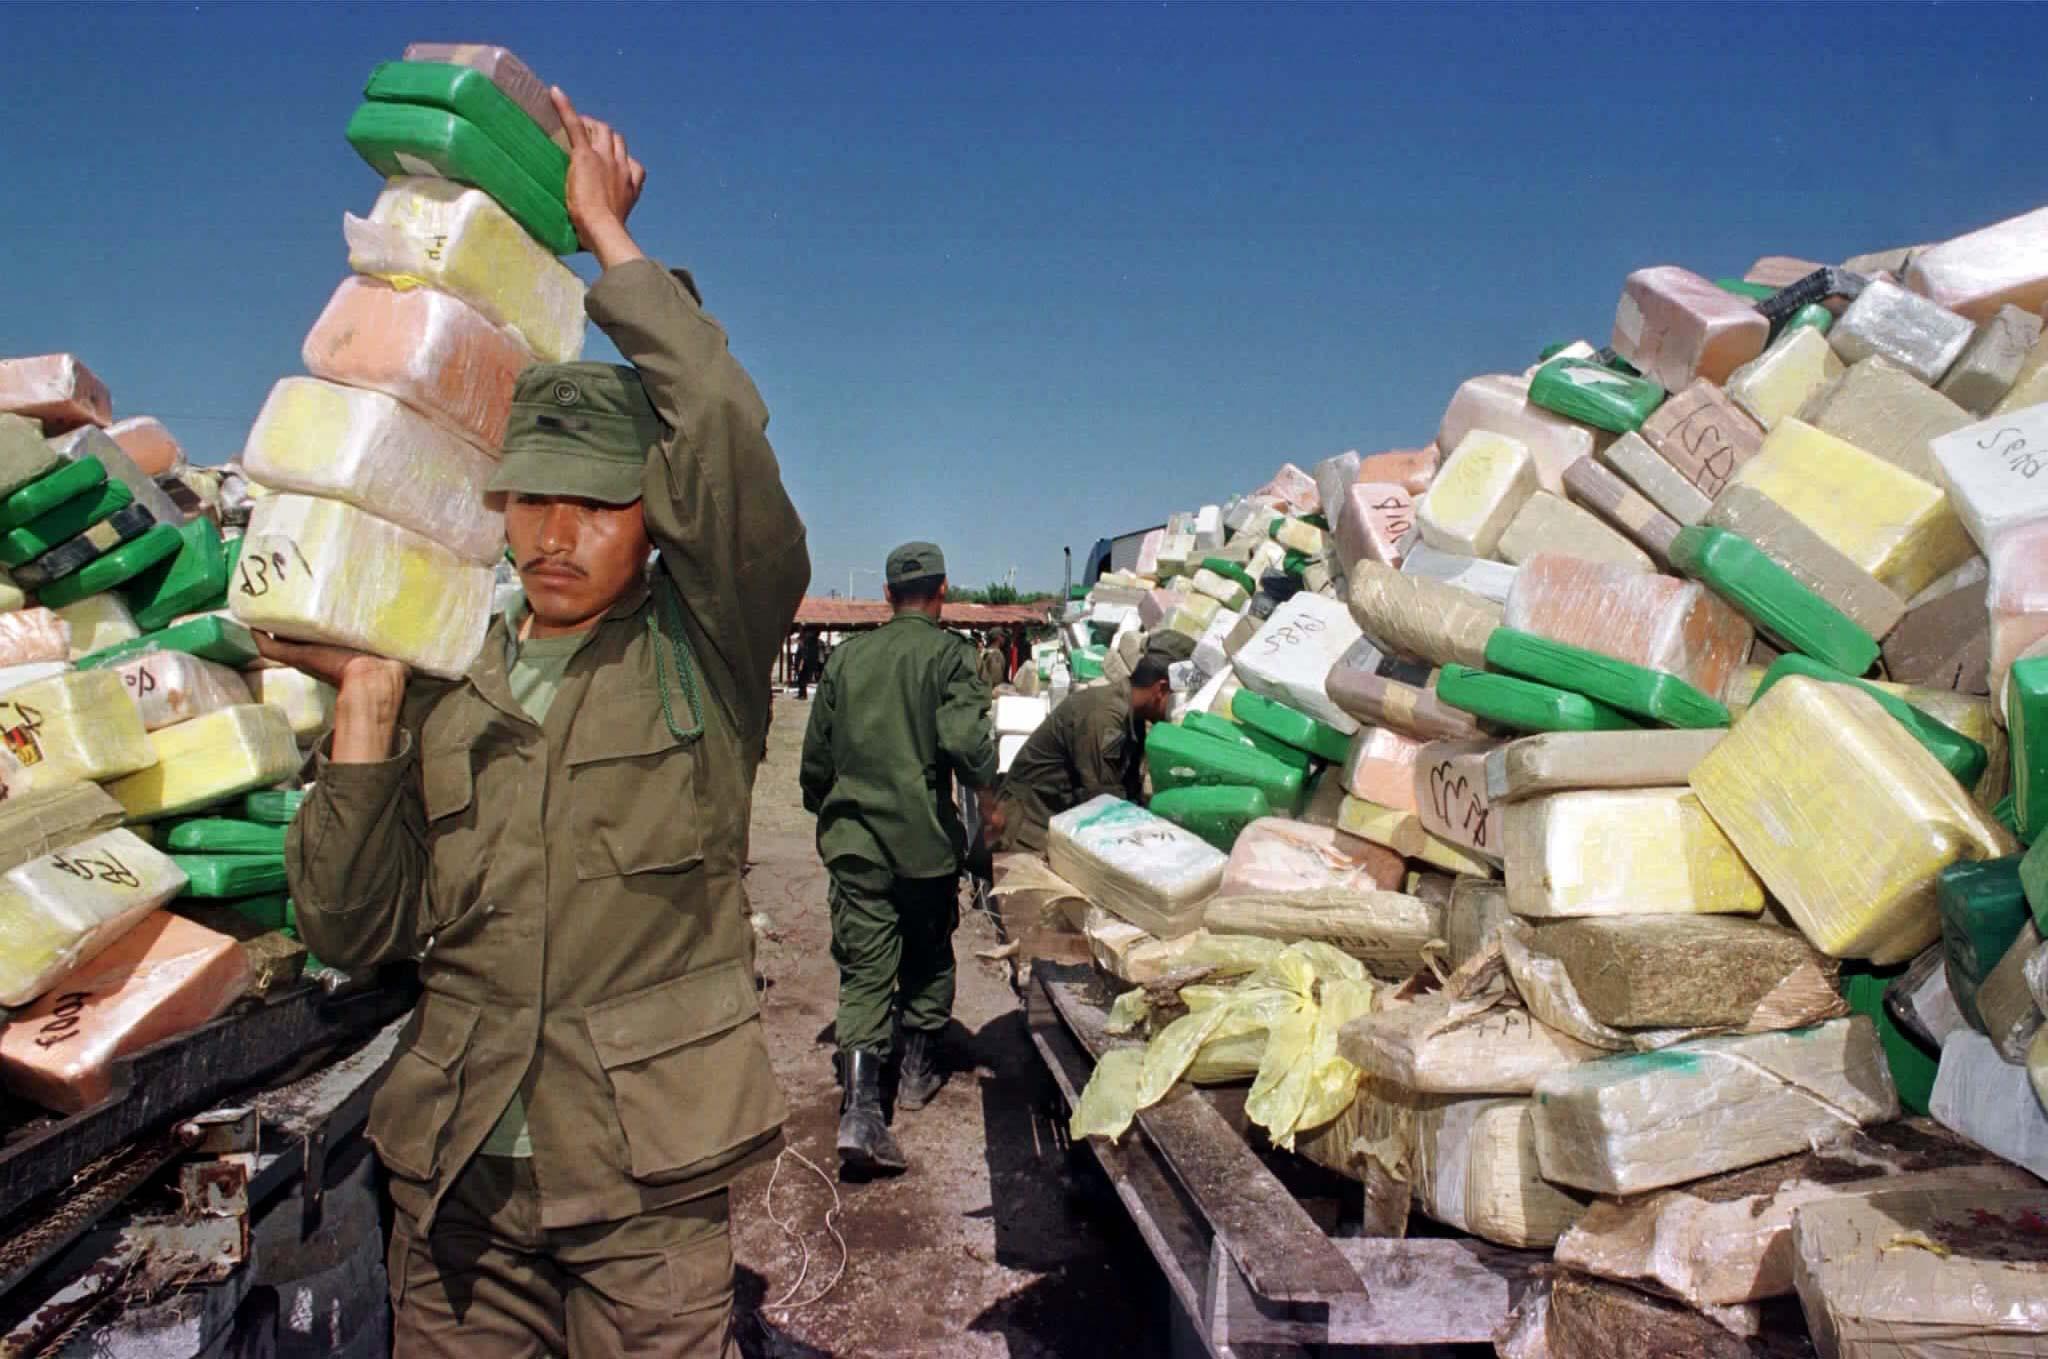 buying prescription drugs in mexico